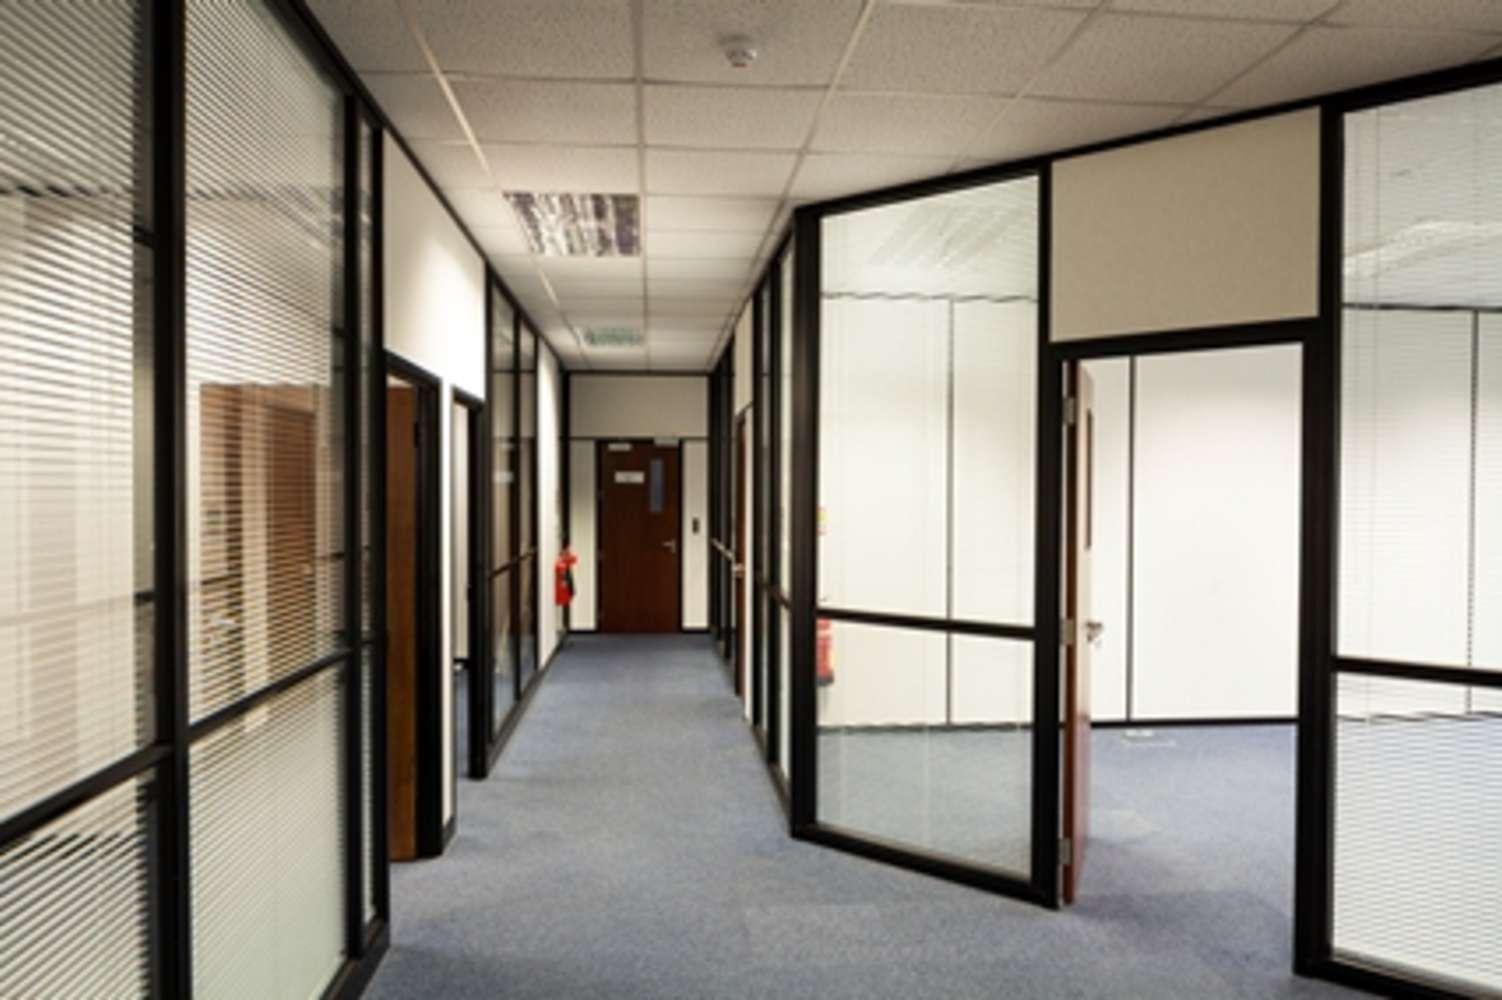 Office Co dubin, K67 V3W4 - Unit 1, Swords Business Campus - 493536